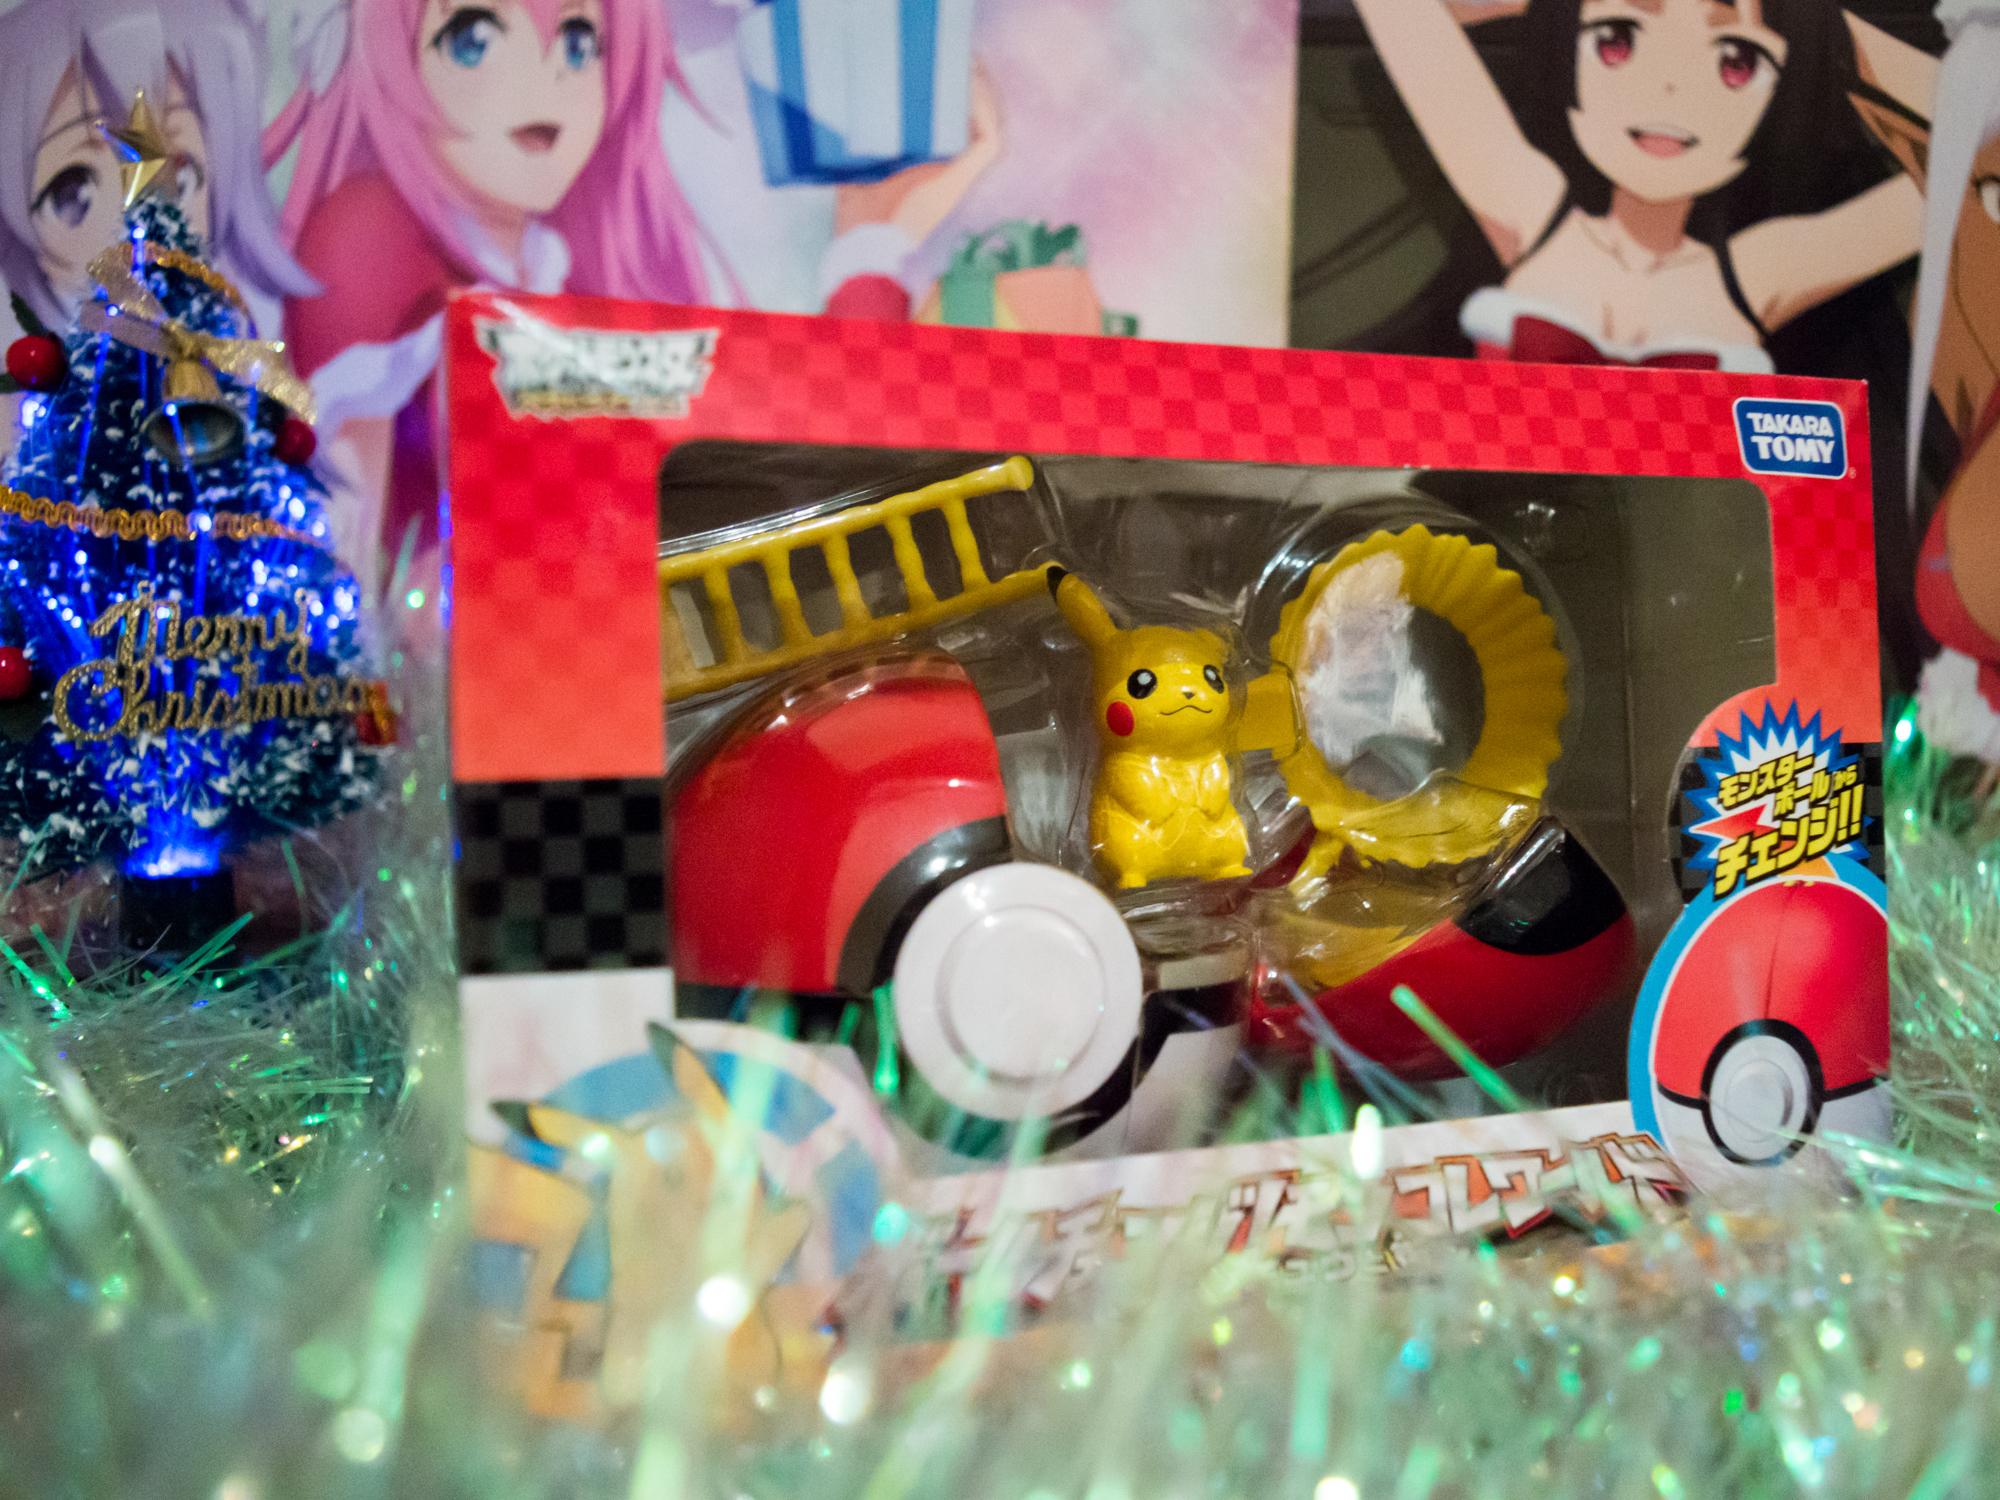 Anime Toy Lucky Grab Fuku-Bukuro 2016 Bag From JList 0009